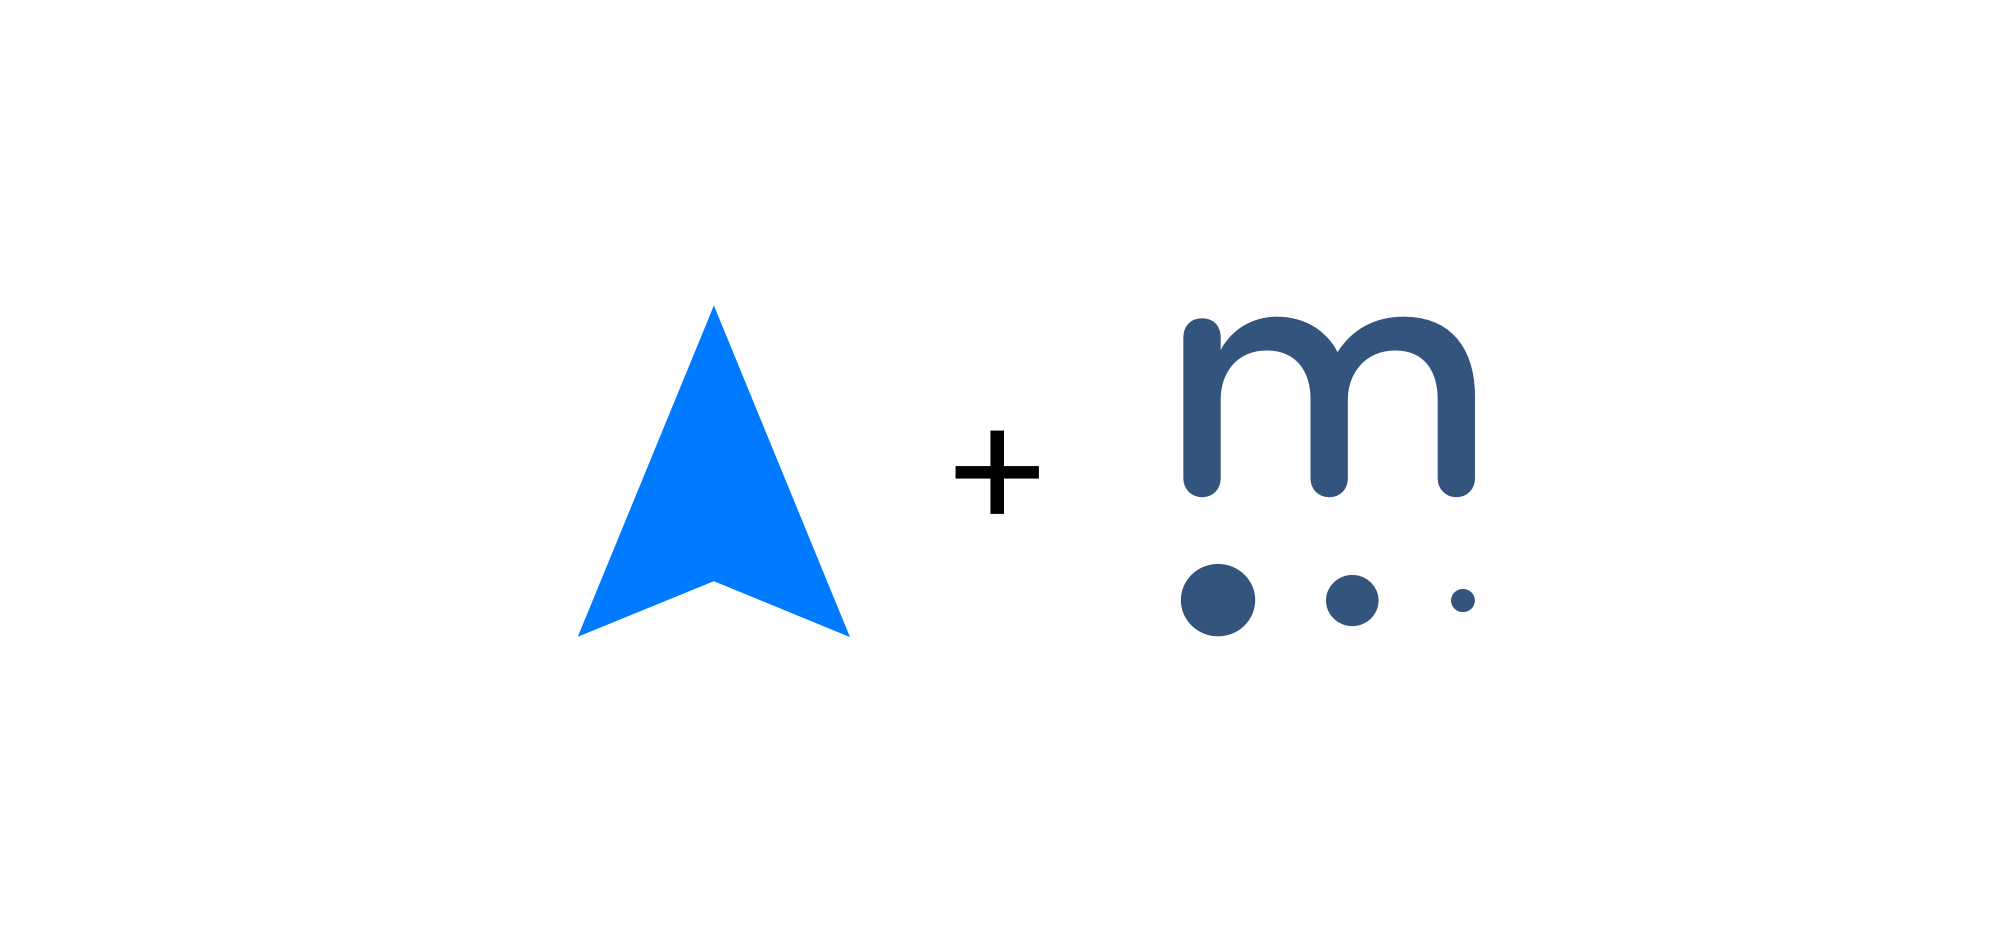 https://s3.amazonaws.com/io.radar.blog/posts/announcing-our-mixpanel-integration/mixpanel.png